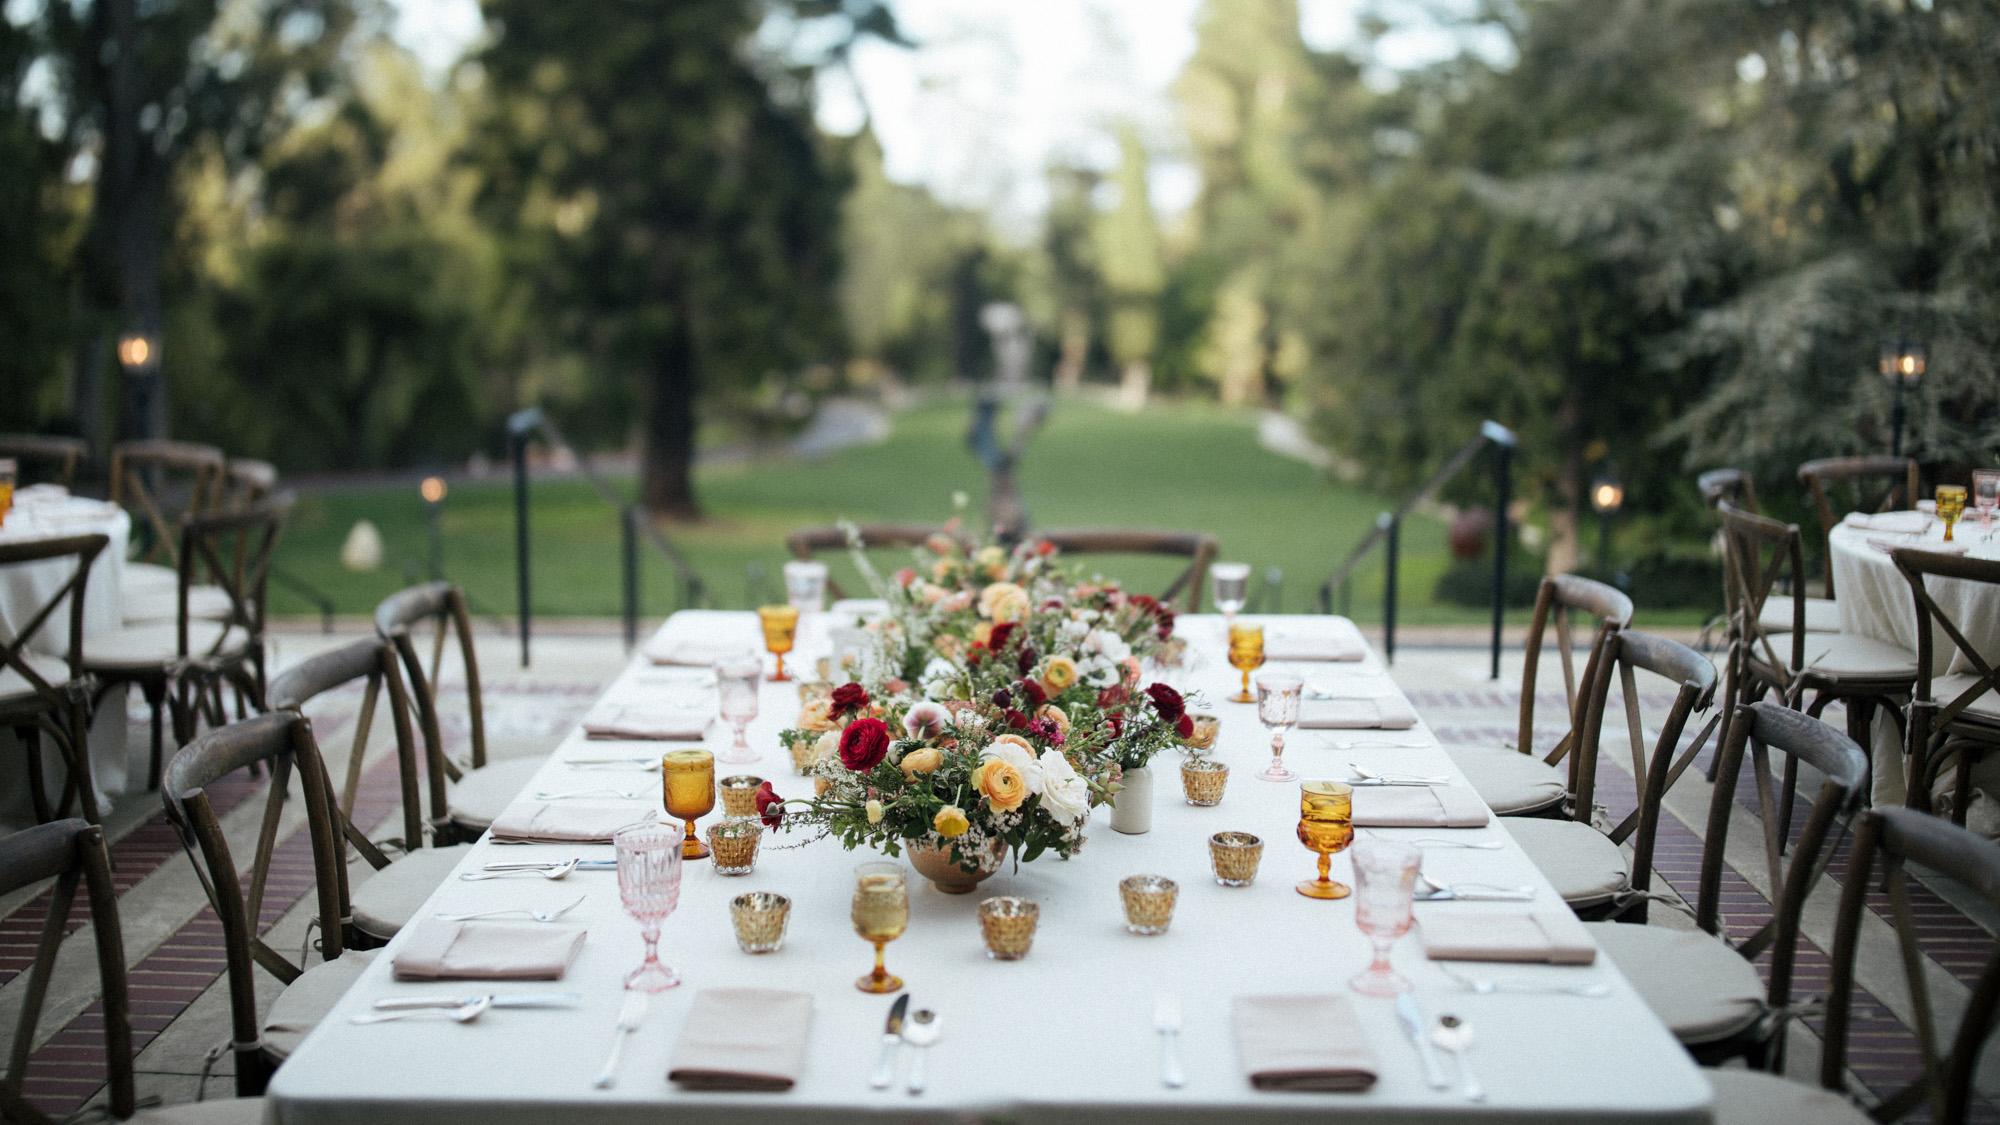 anu_maneesh_alec_vanderboom_Indian_wedding_photography-0137.jpg